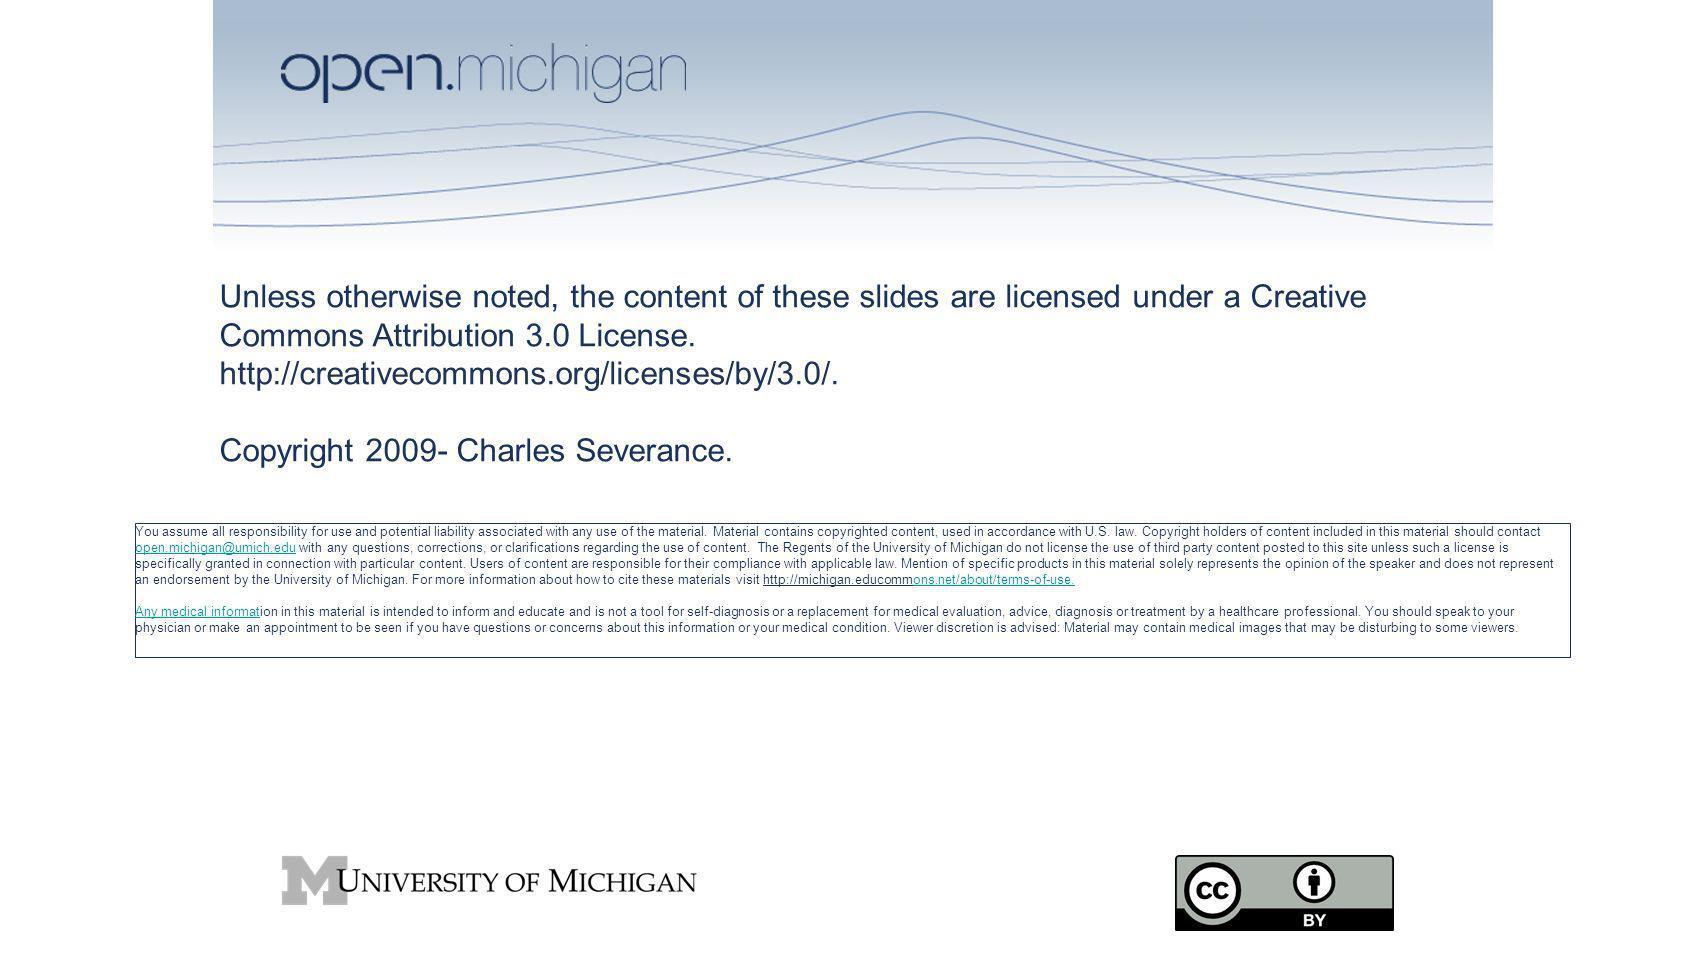 Copyright 2009- Charles Severance.